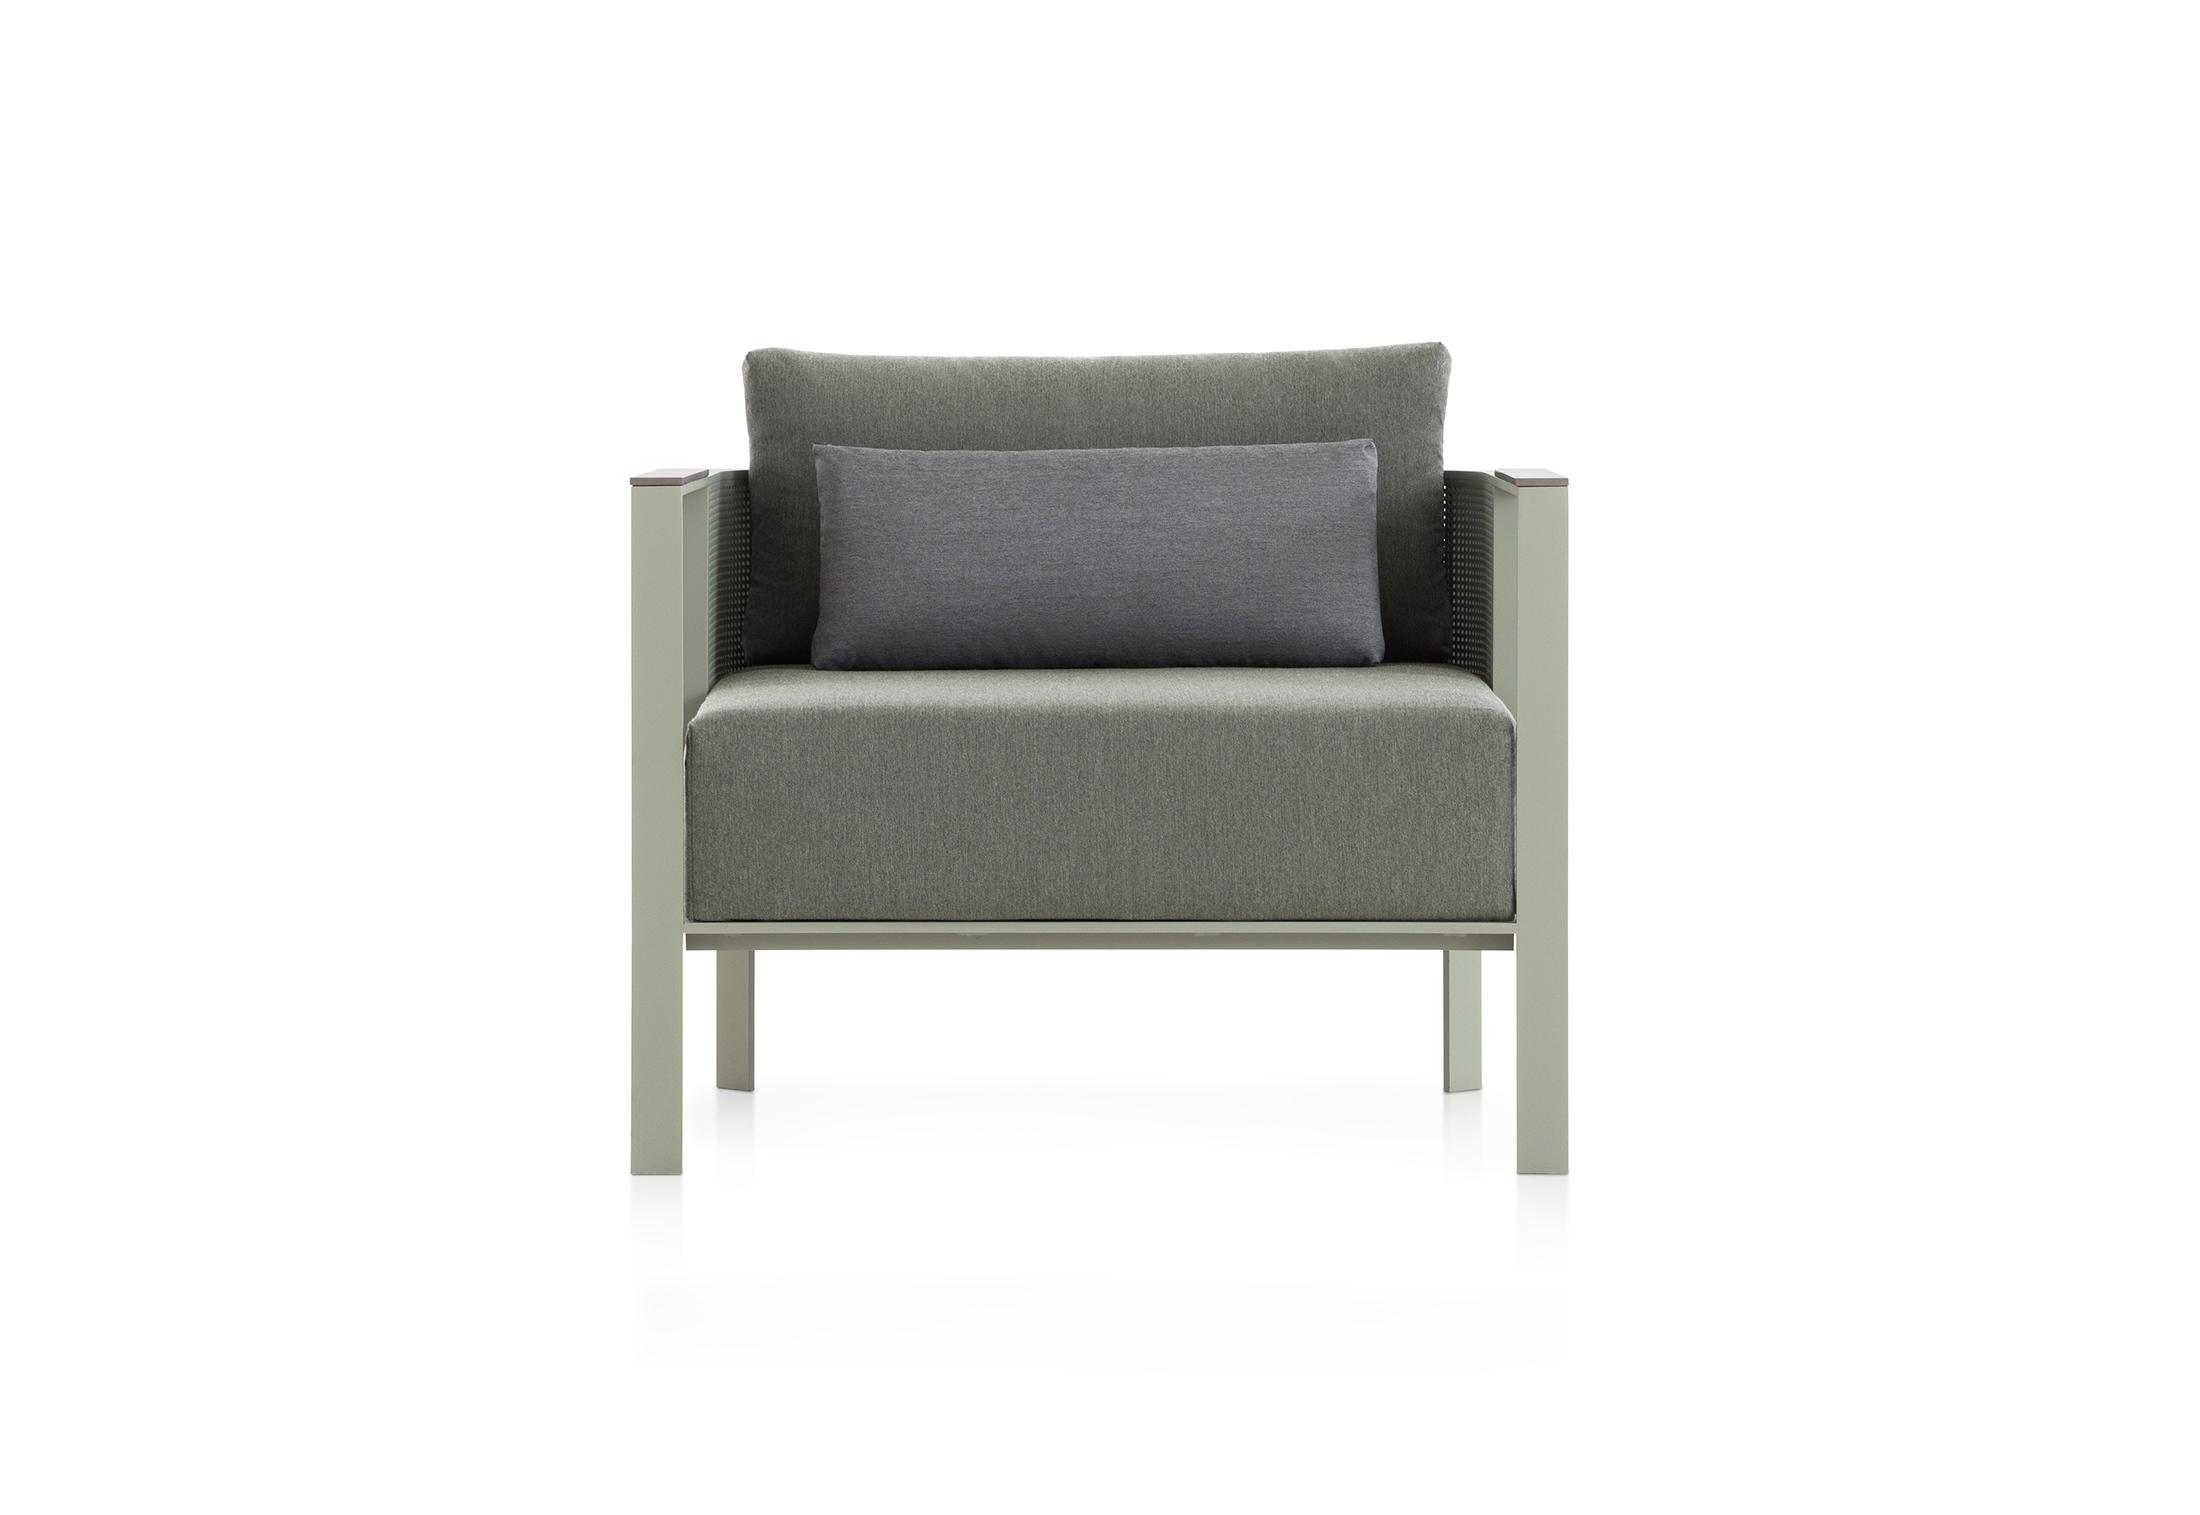 gandia blasco clack chair best for baby nursery solanas easy by stylepark